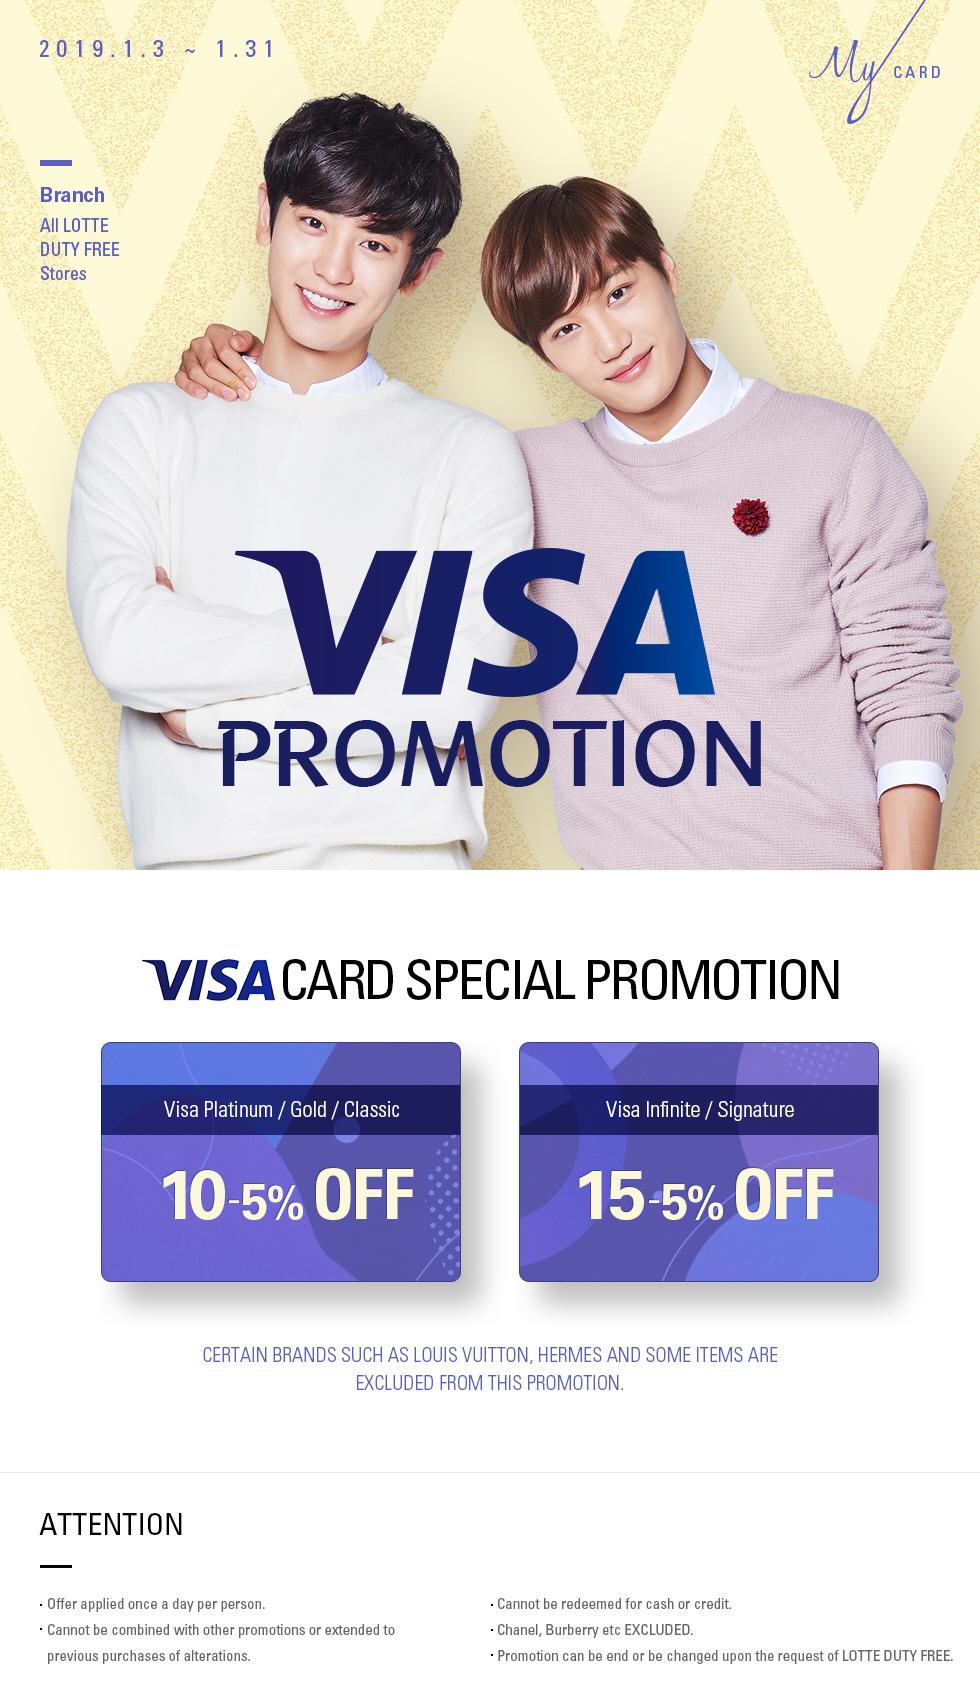 VISA Card Special Promotion